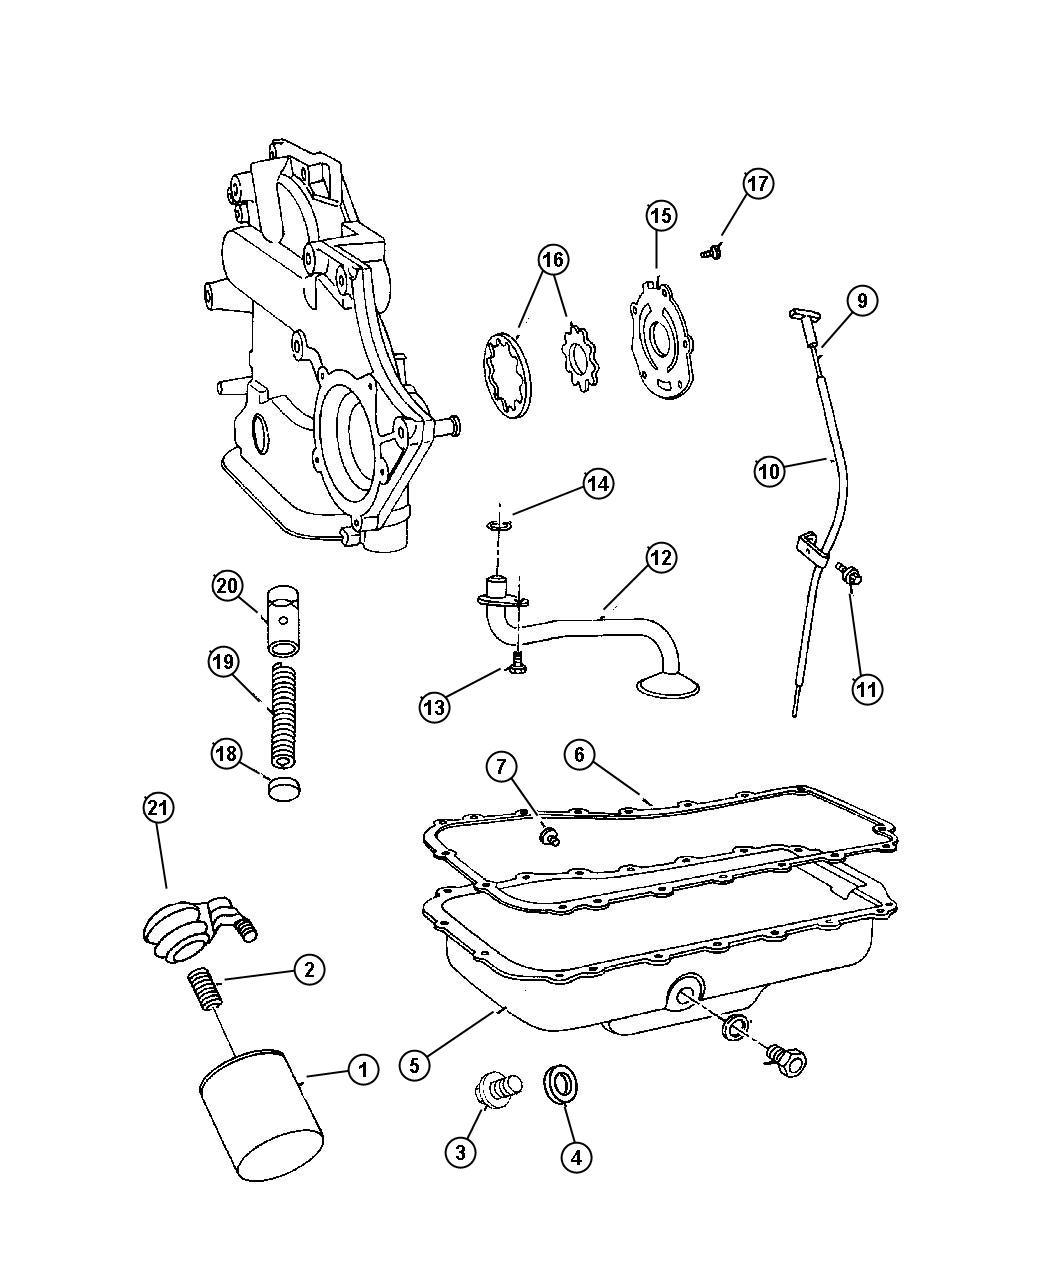 1998 Dodge Grand Caravan Adapter, connector. Oil filter. 3 ...